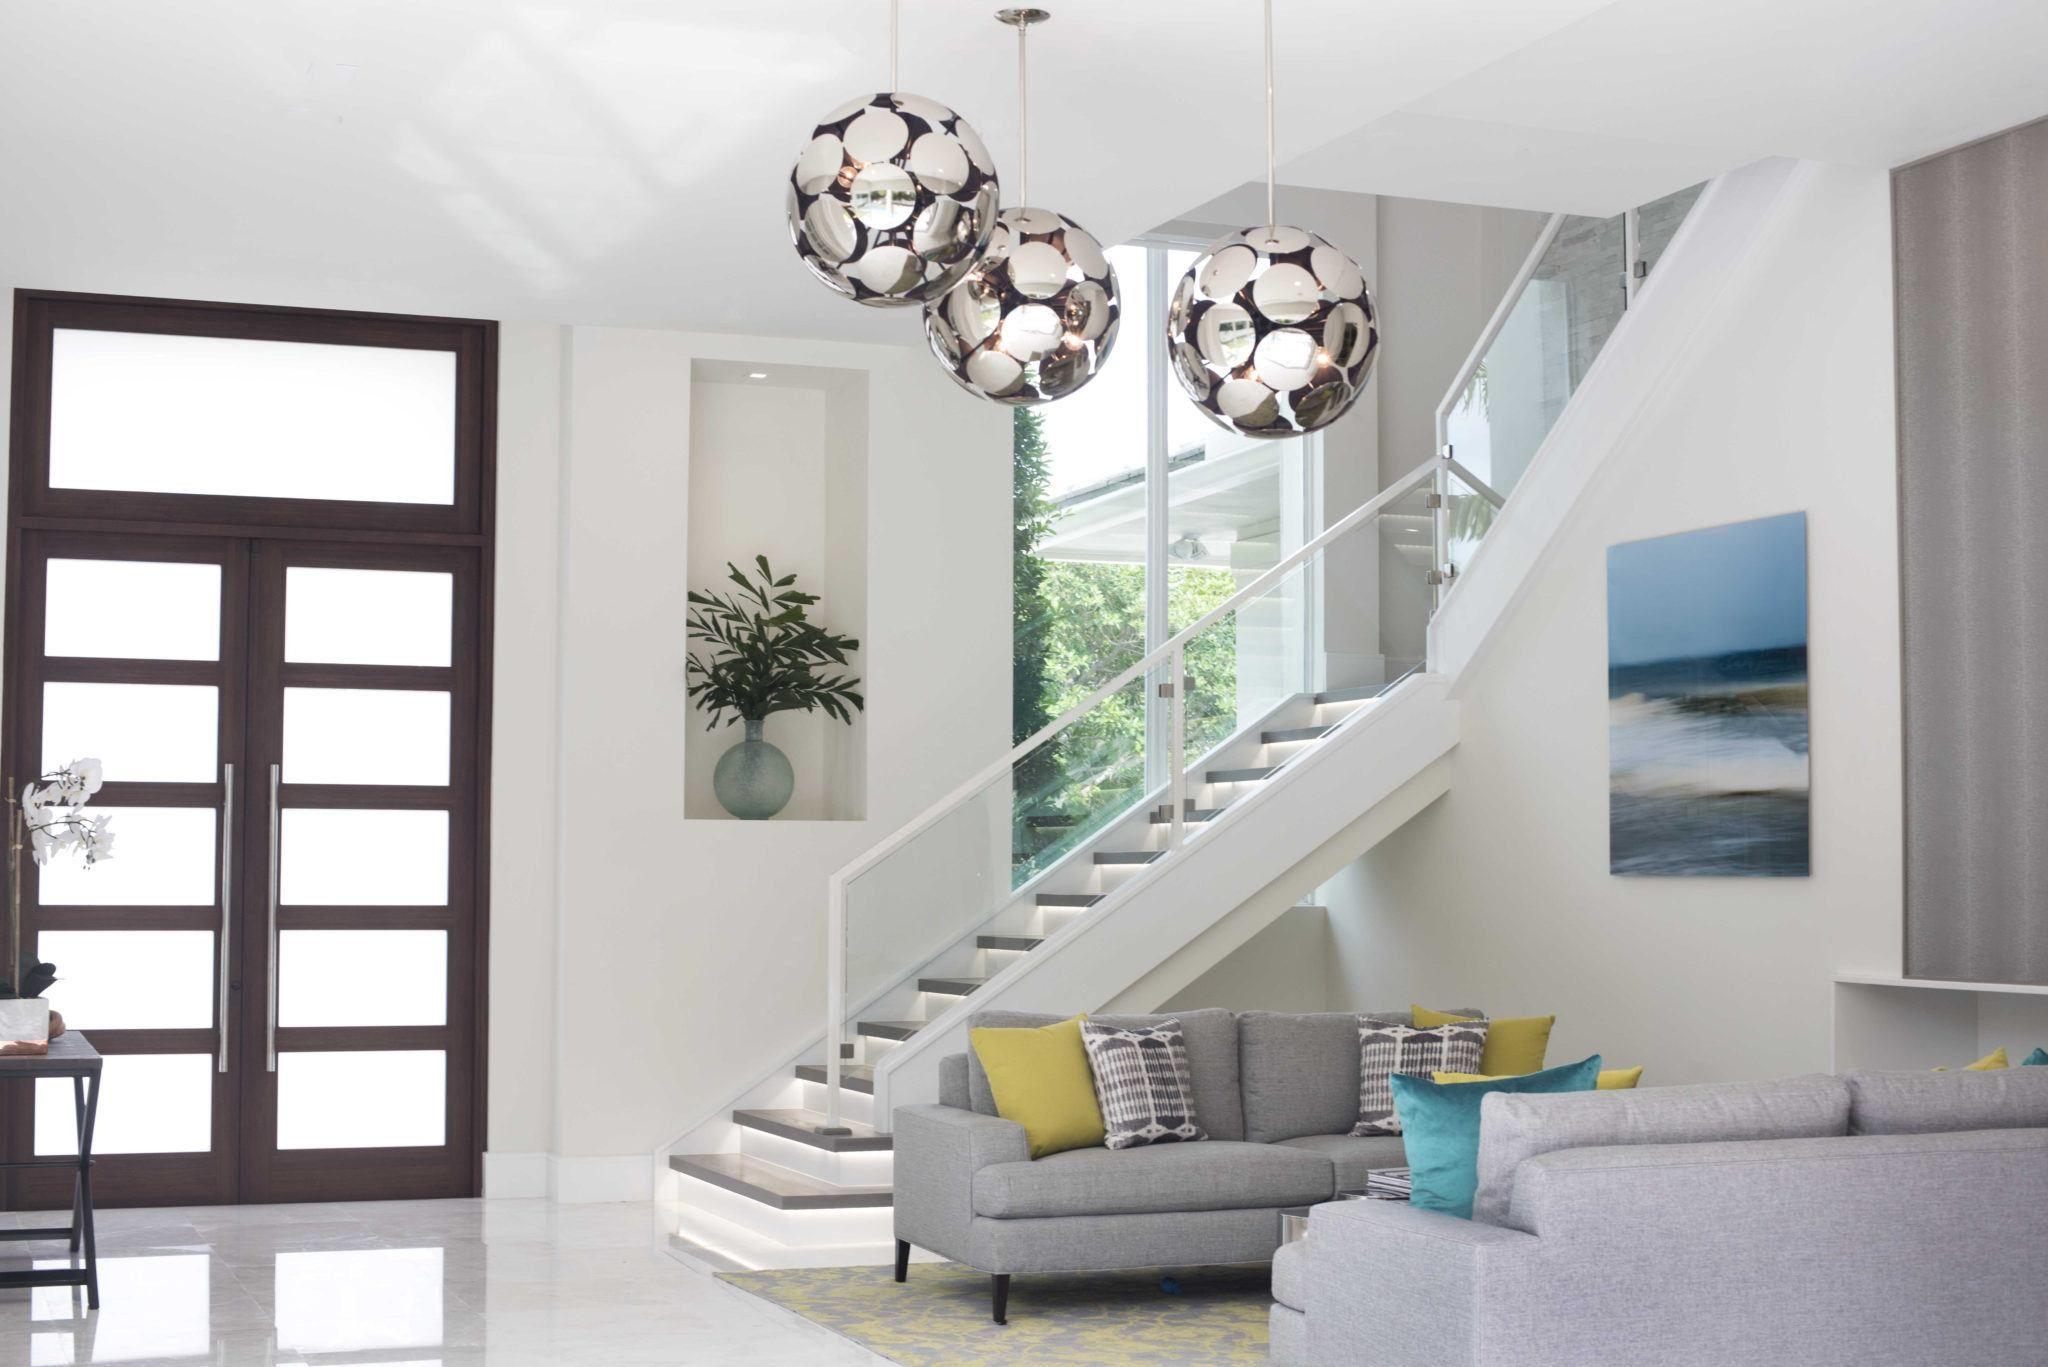 Drama And Comfort Seagate Contemporary Florida Interior Design Beach Interior Design Contemporary Interior Design